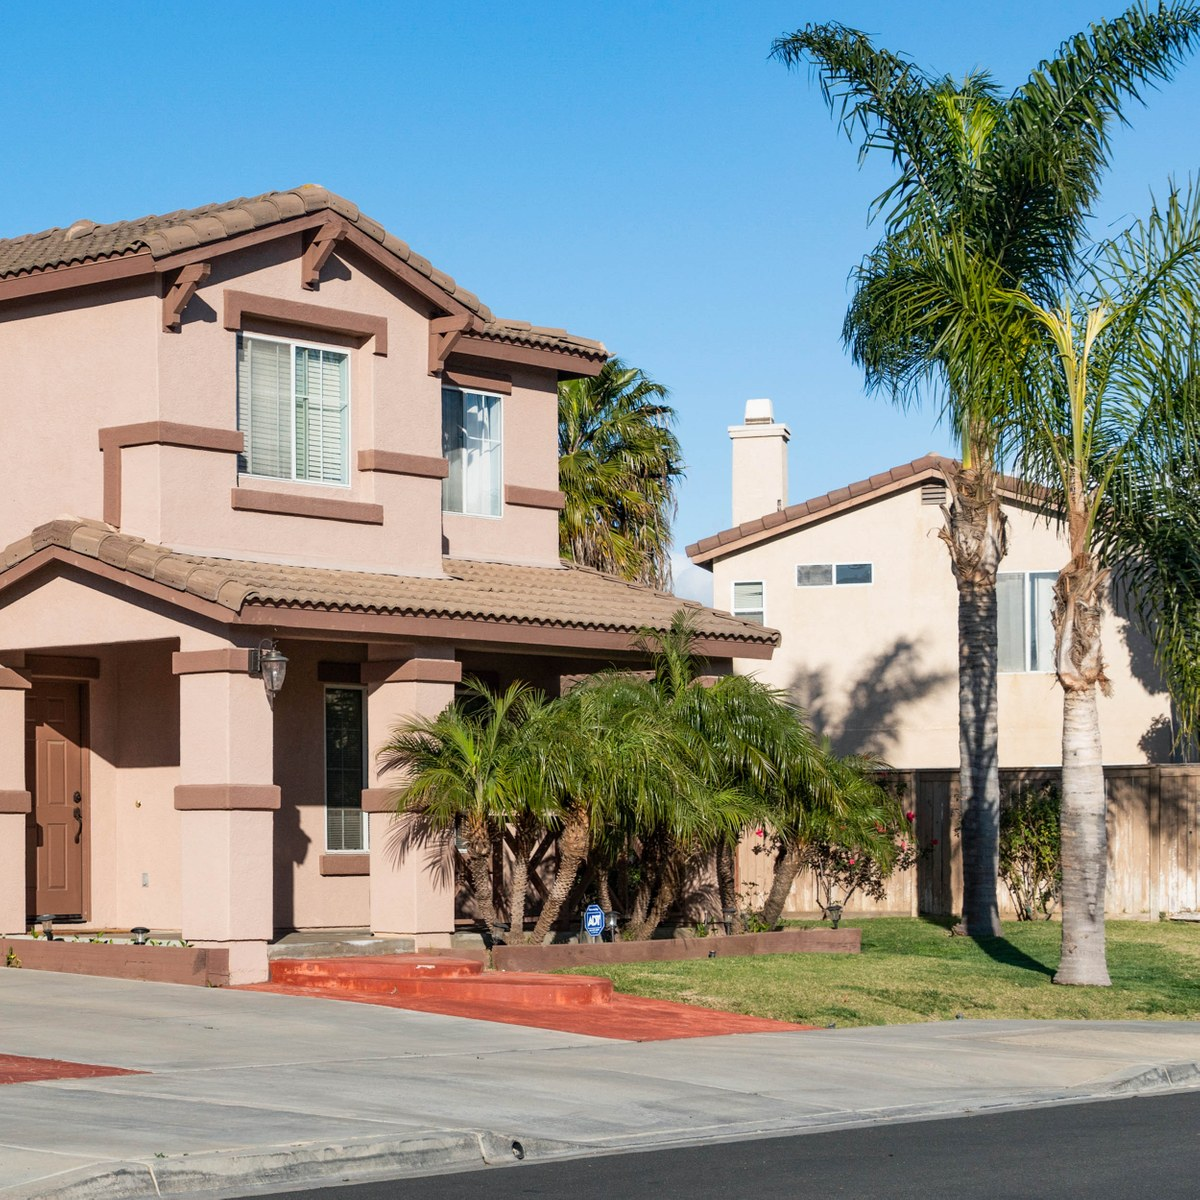 San Ysidro, San Diego CA - Neighborhood Guide